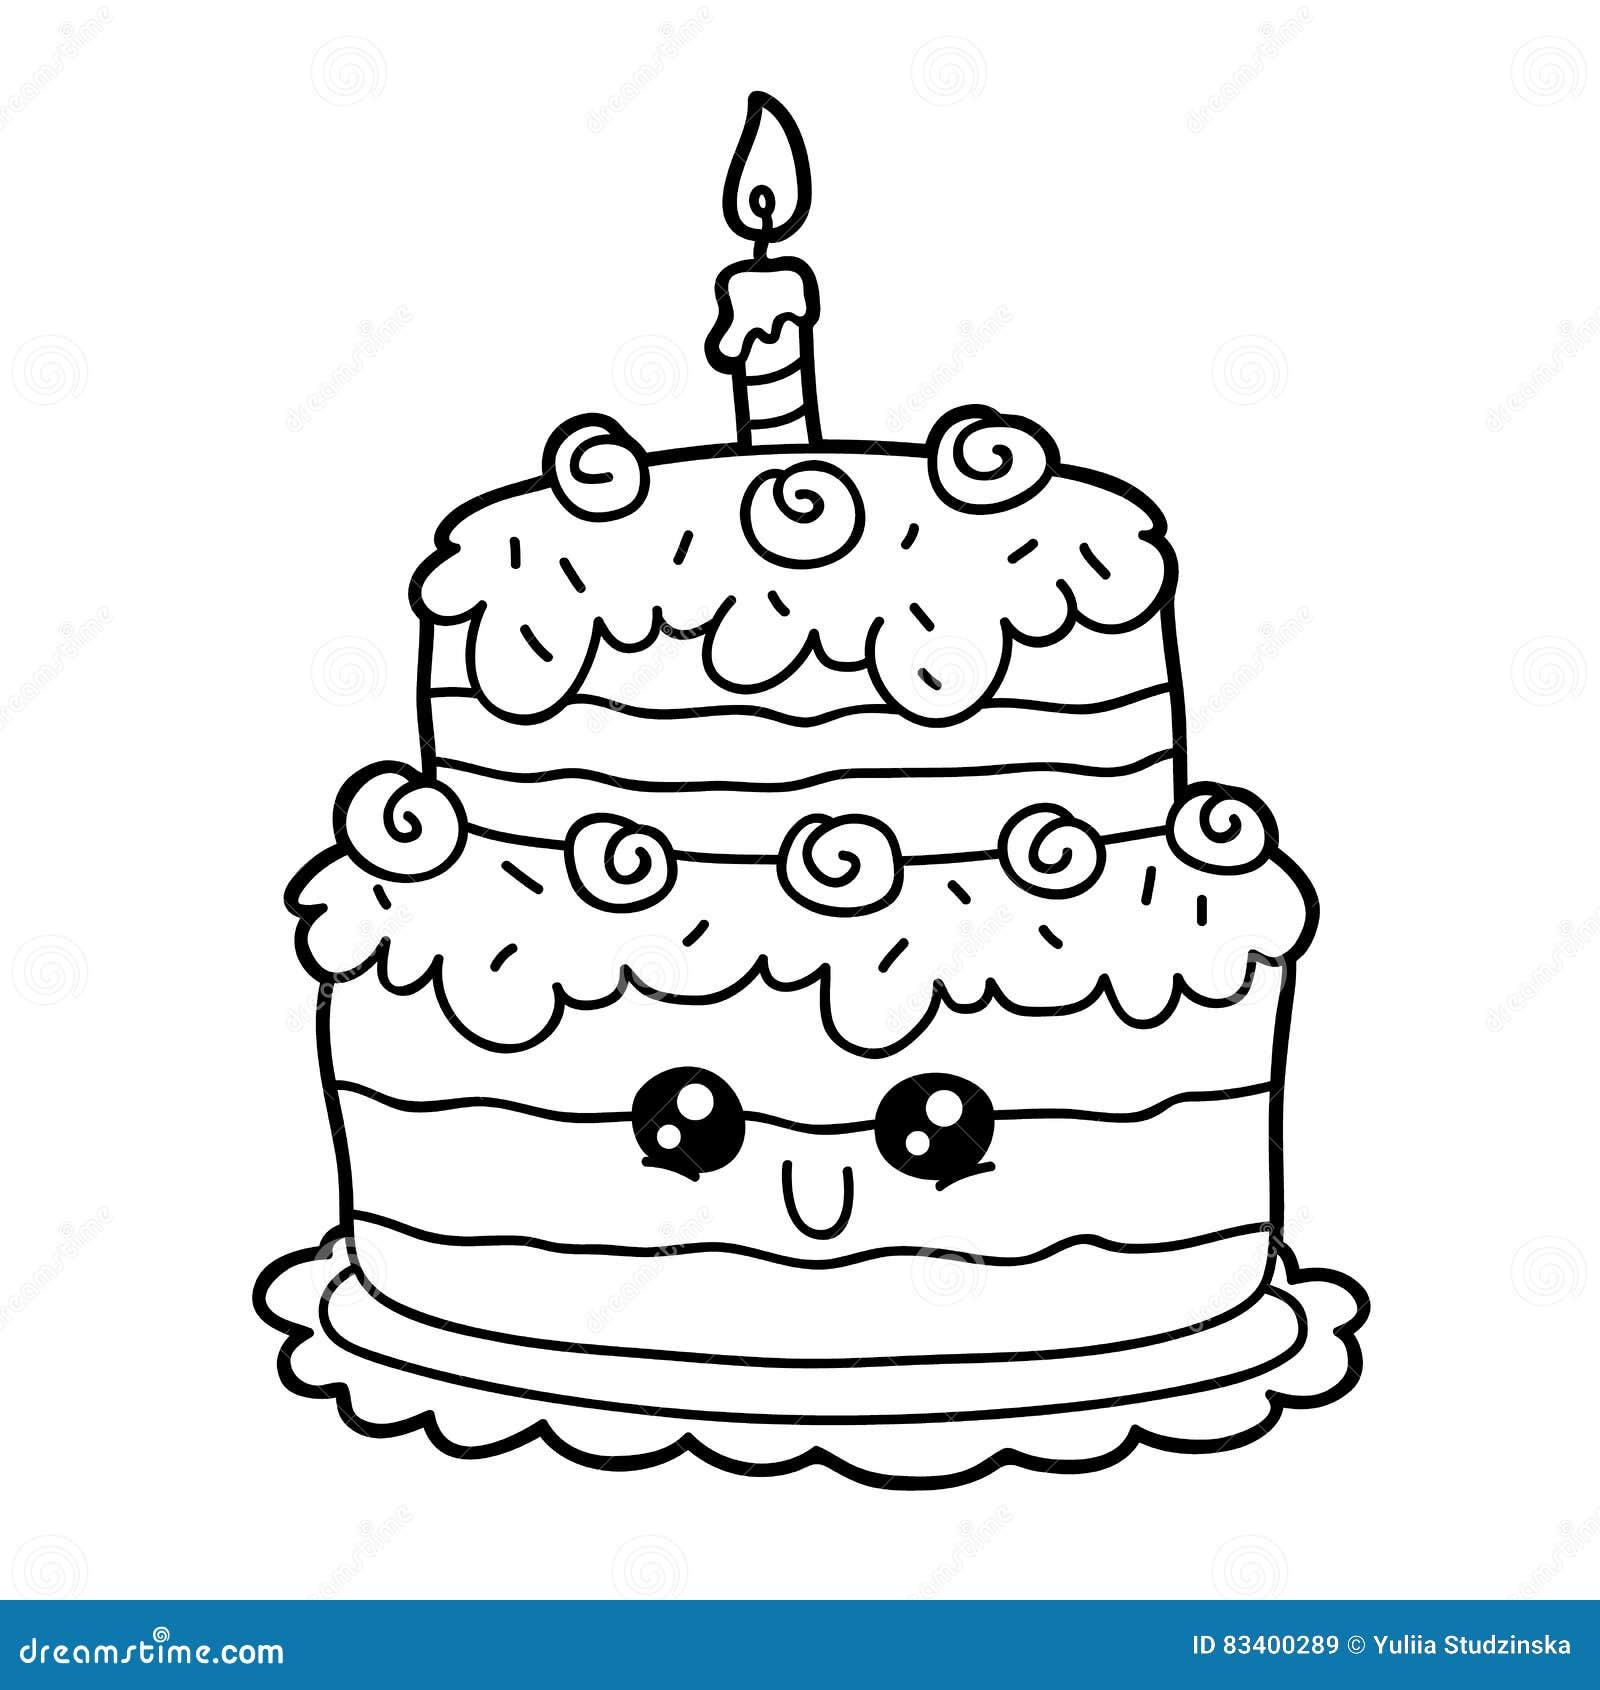 Cartoon Cake Stock Vector Illustration Of Cheerful Hand 83400289